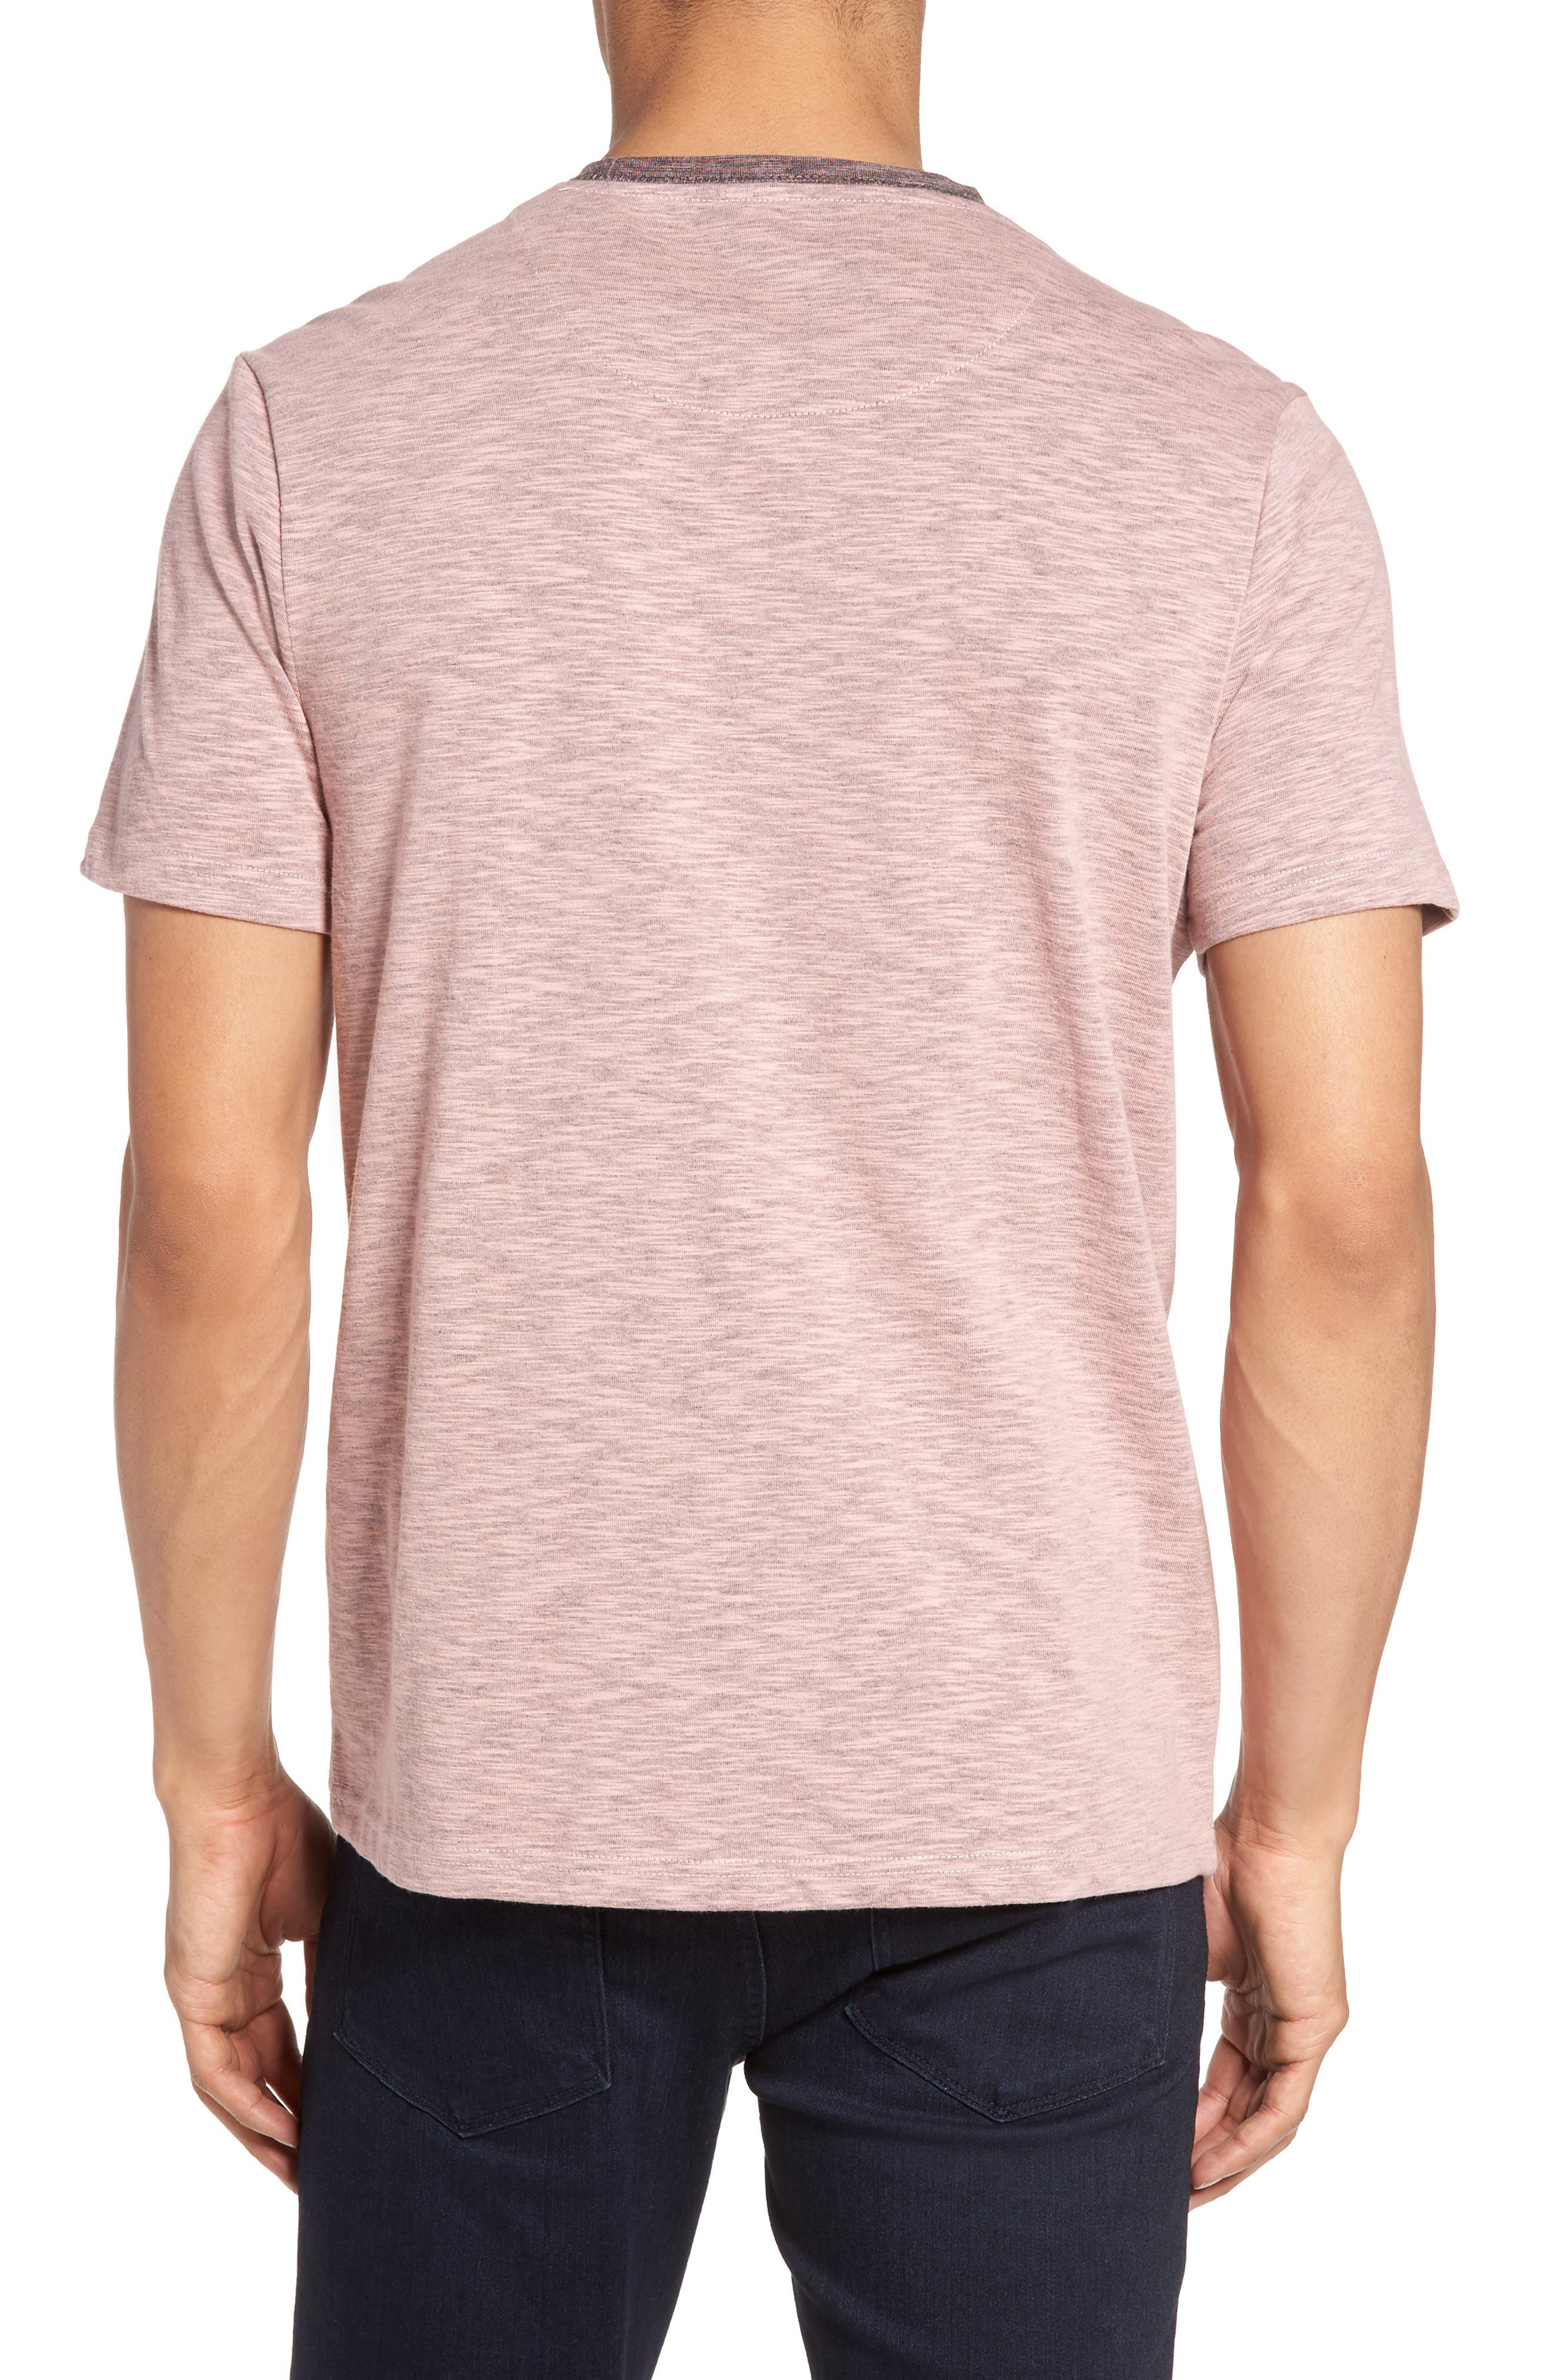 Alternate Image 2  - Vince Camuto Ringer T-Shirt